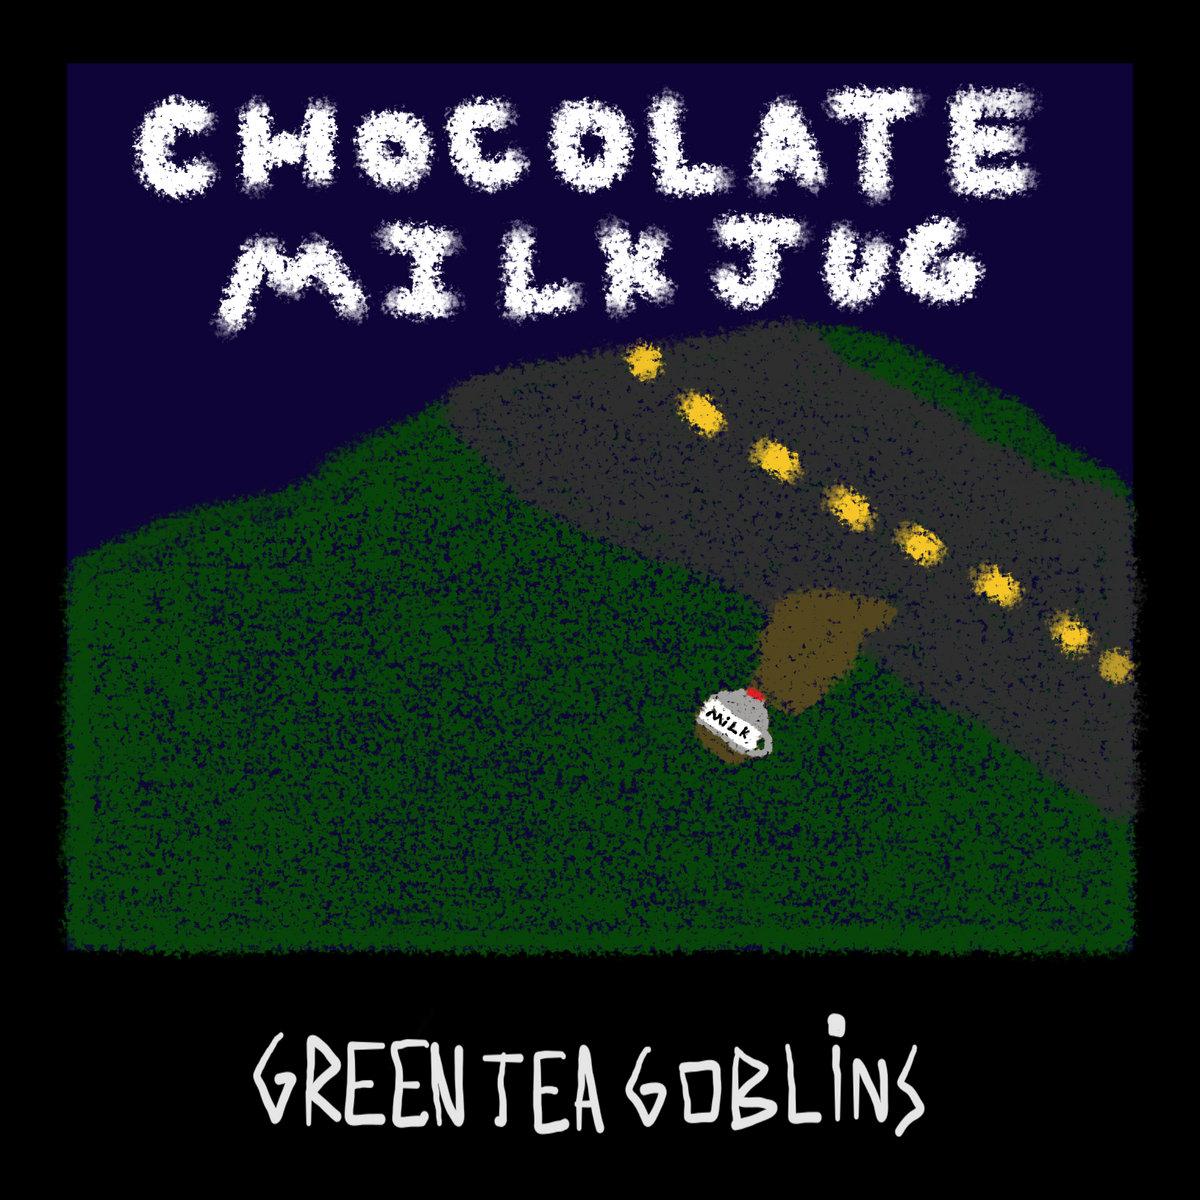 Chocolate Milk Jug by Green Tea Goblins